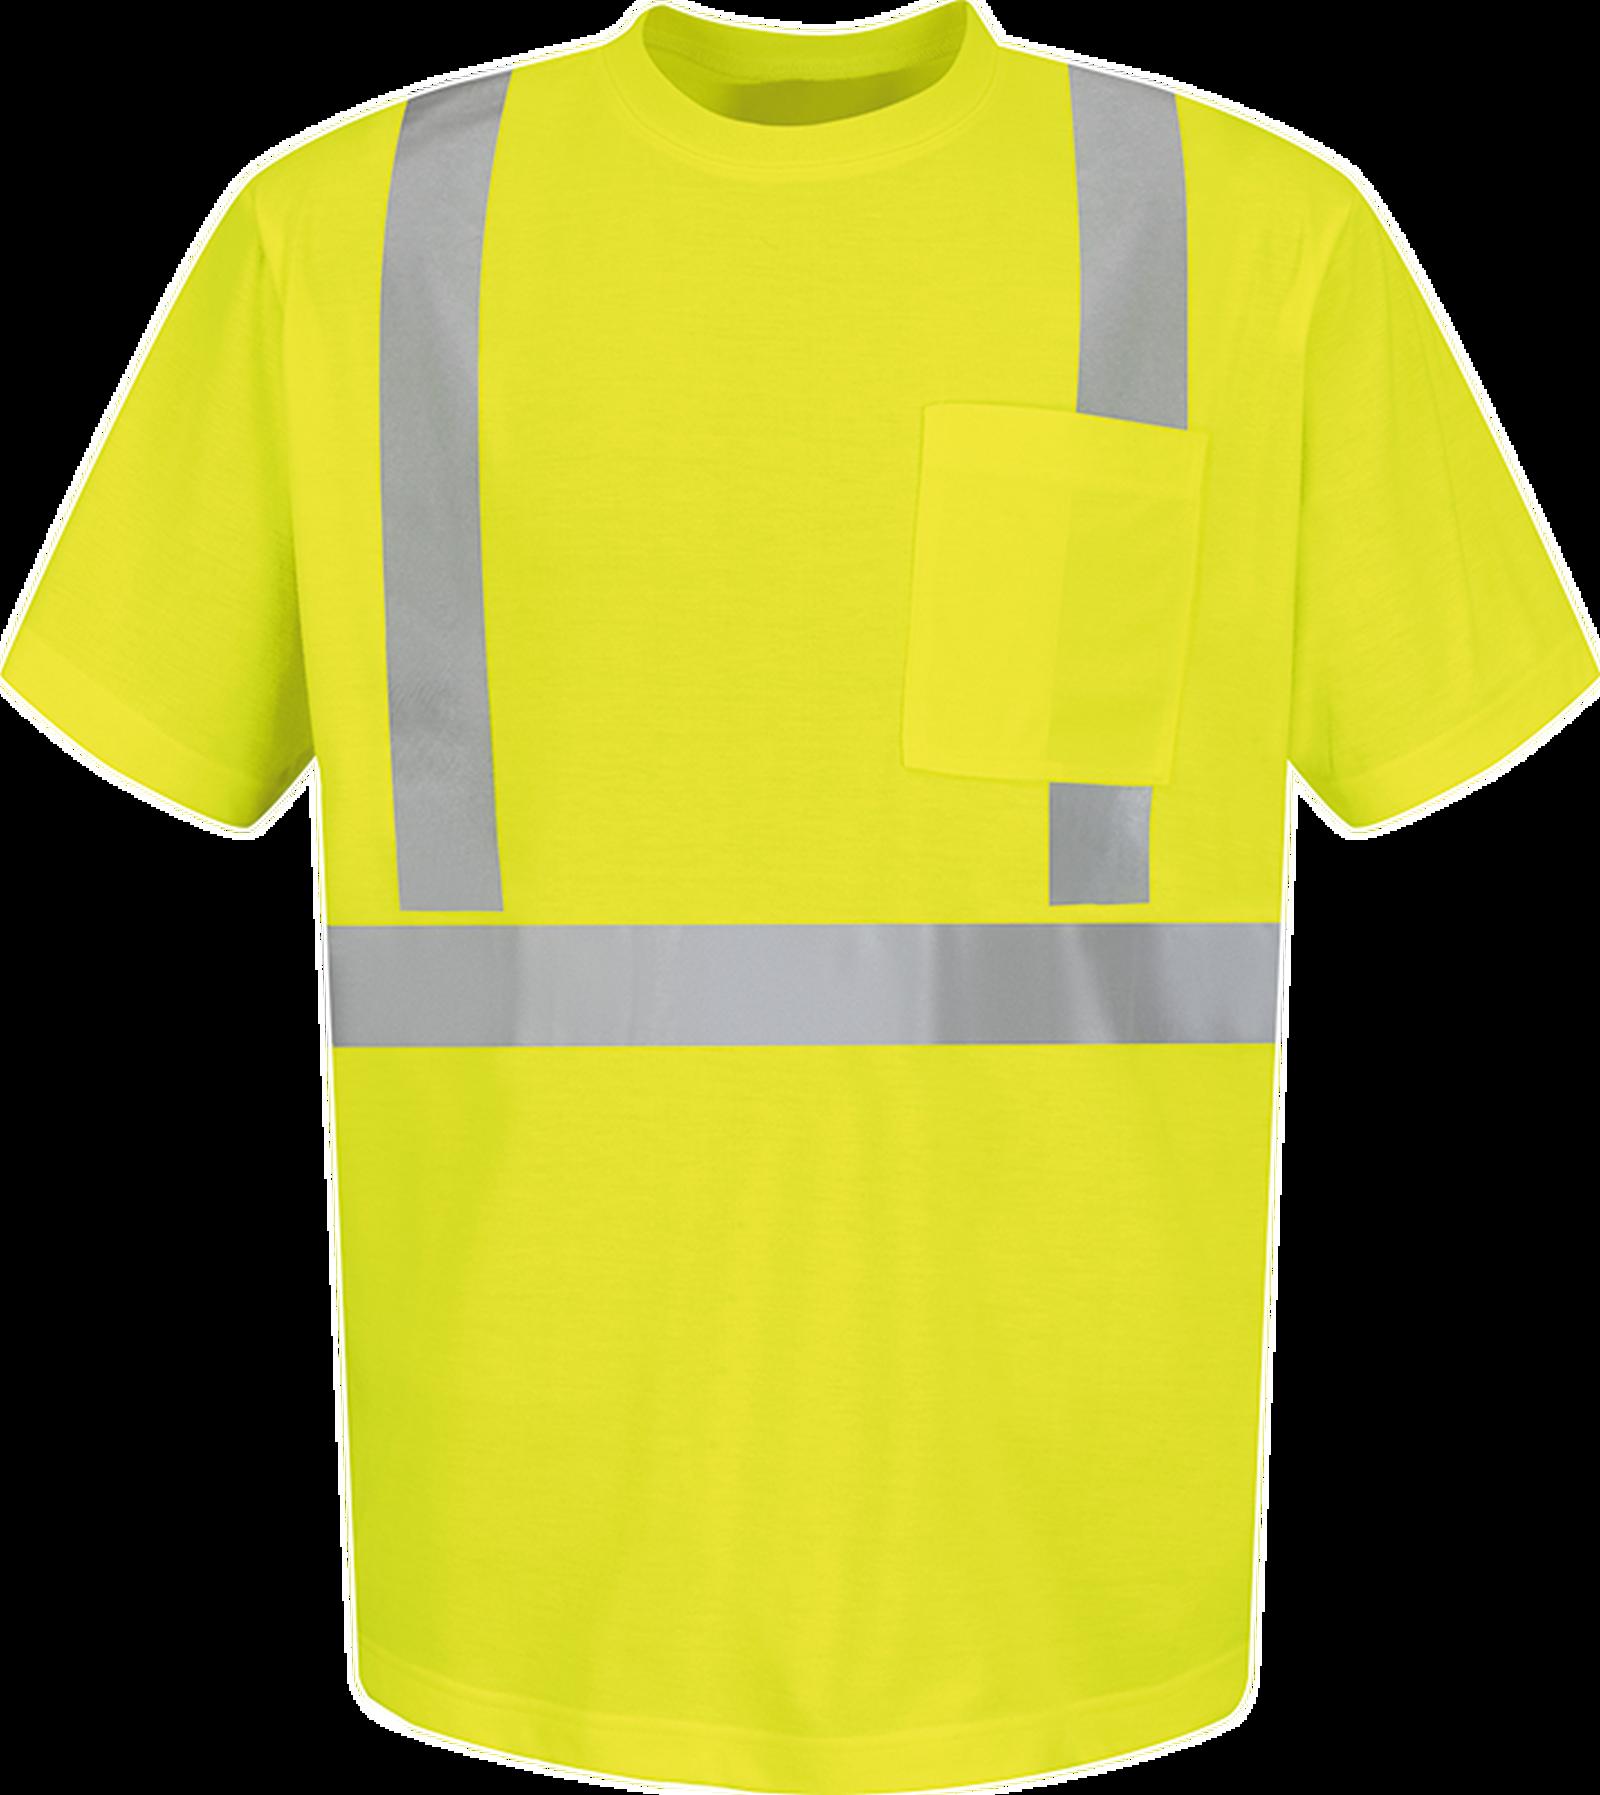 Hi-Visibility Short Sleeve T-Shirt - Type R, Class 2